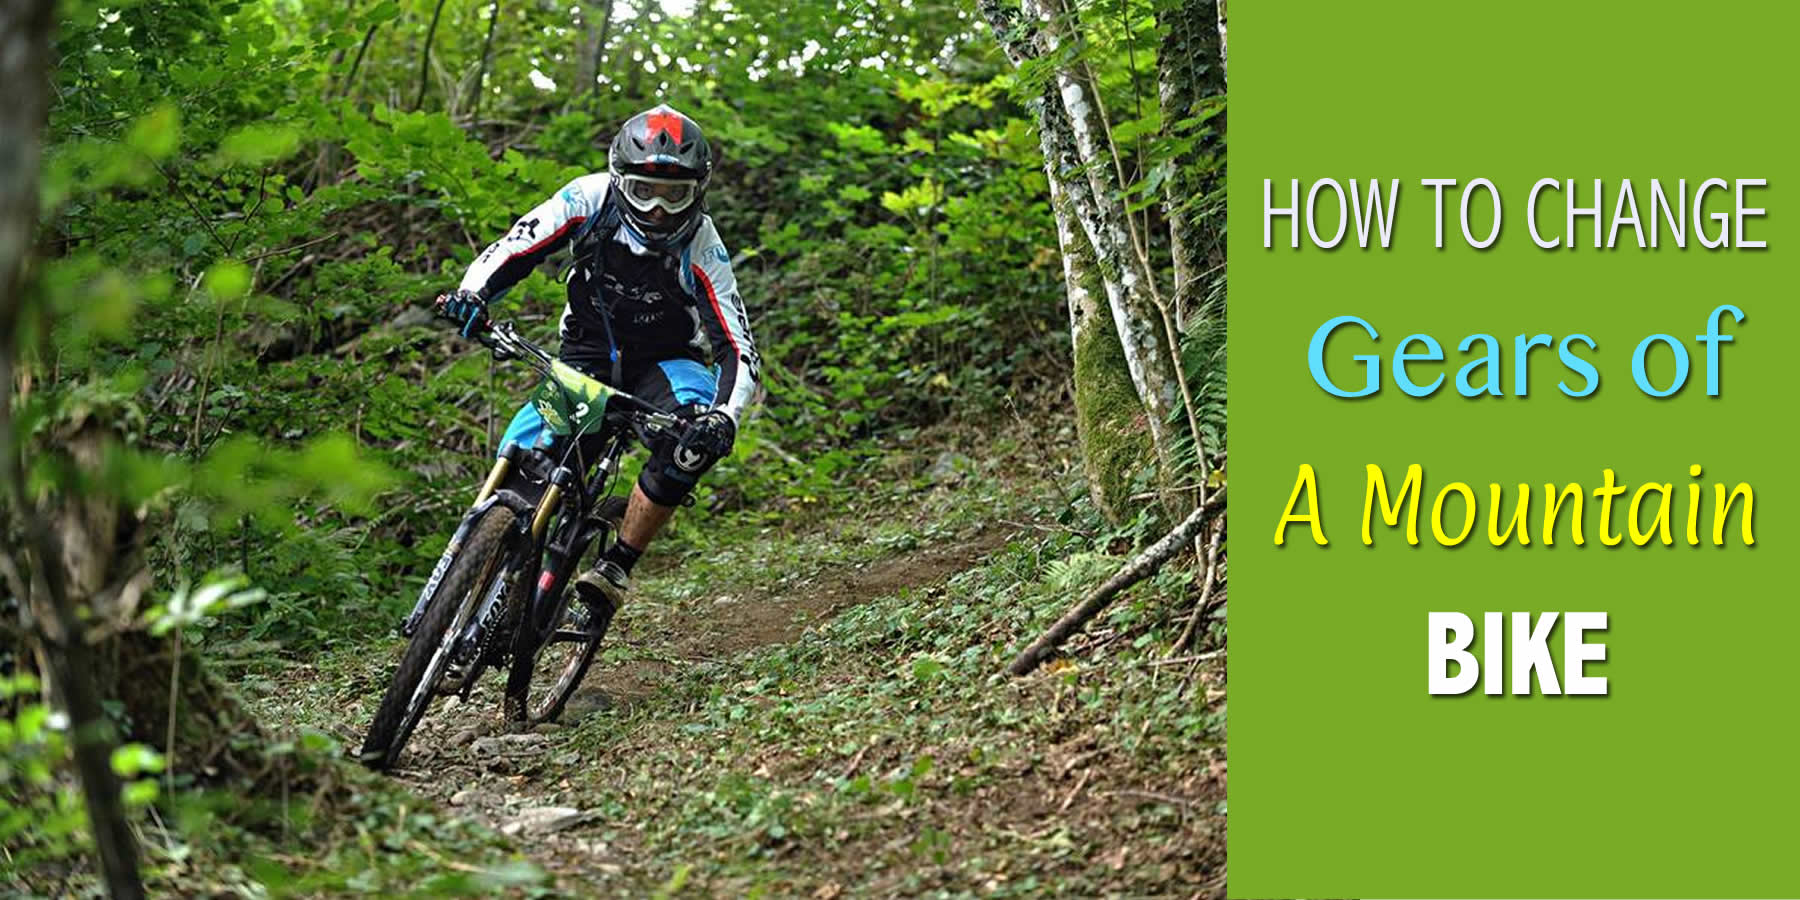 How To Change Gears Of A Mountain Bike